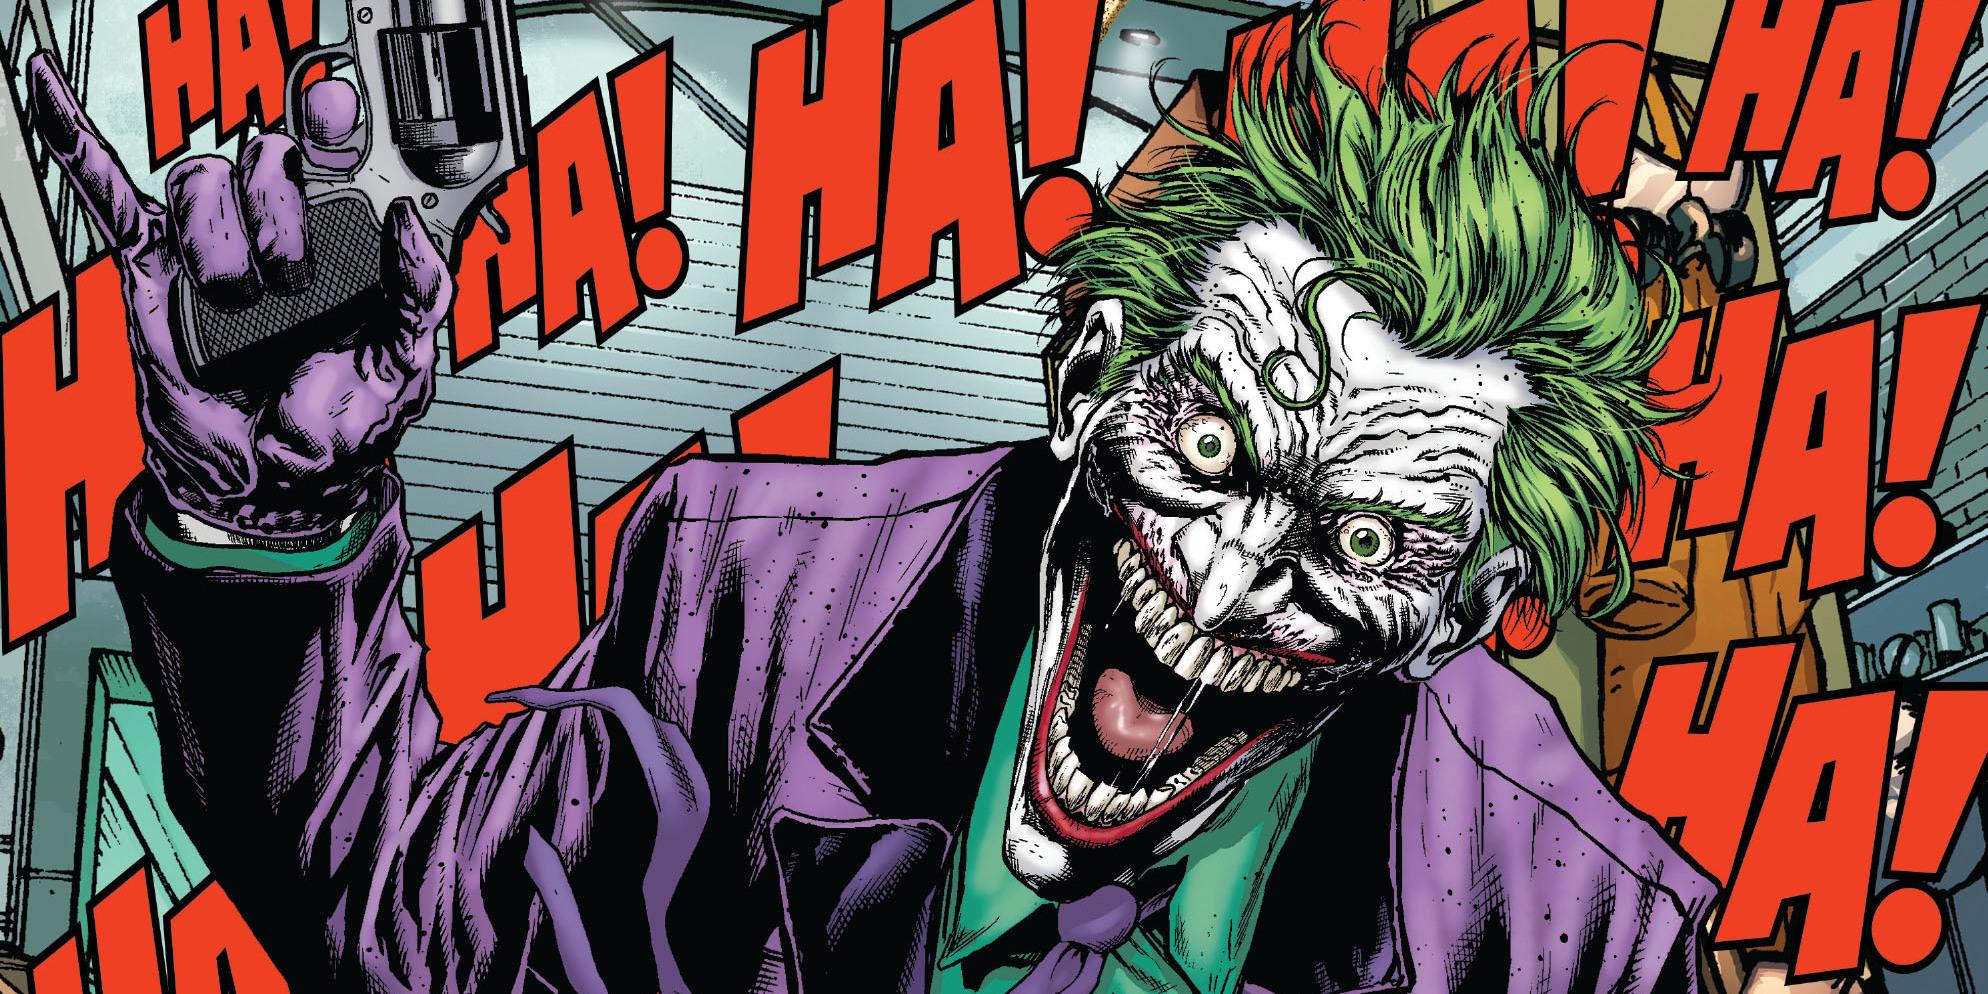 Darren Aronofsky: Joker Origin Movie Resembles His Batman Pitch